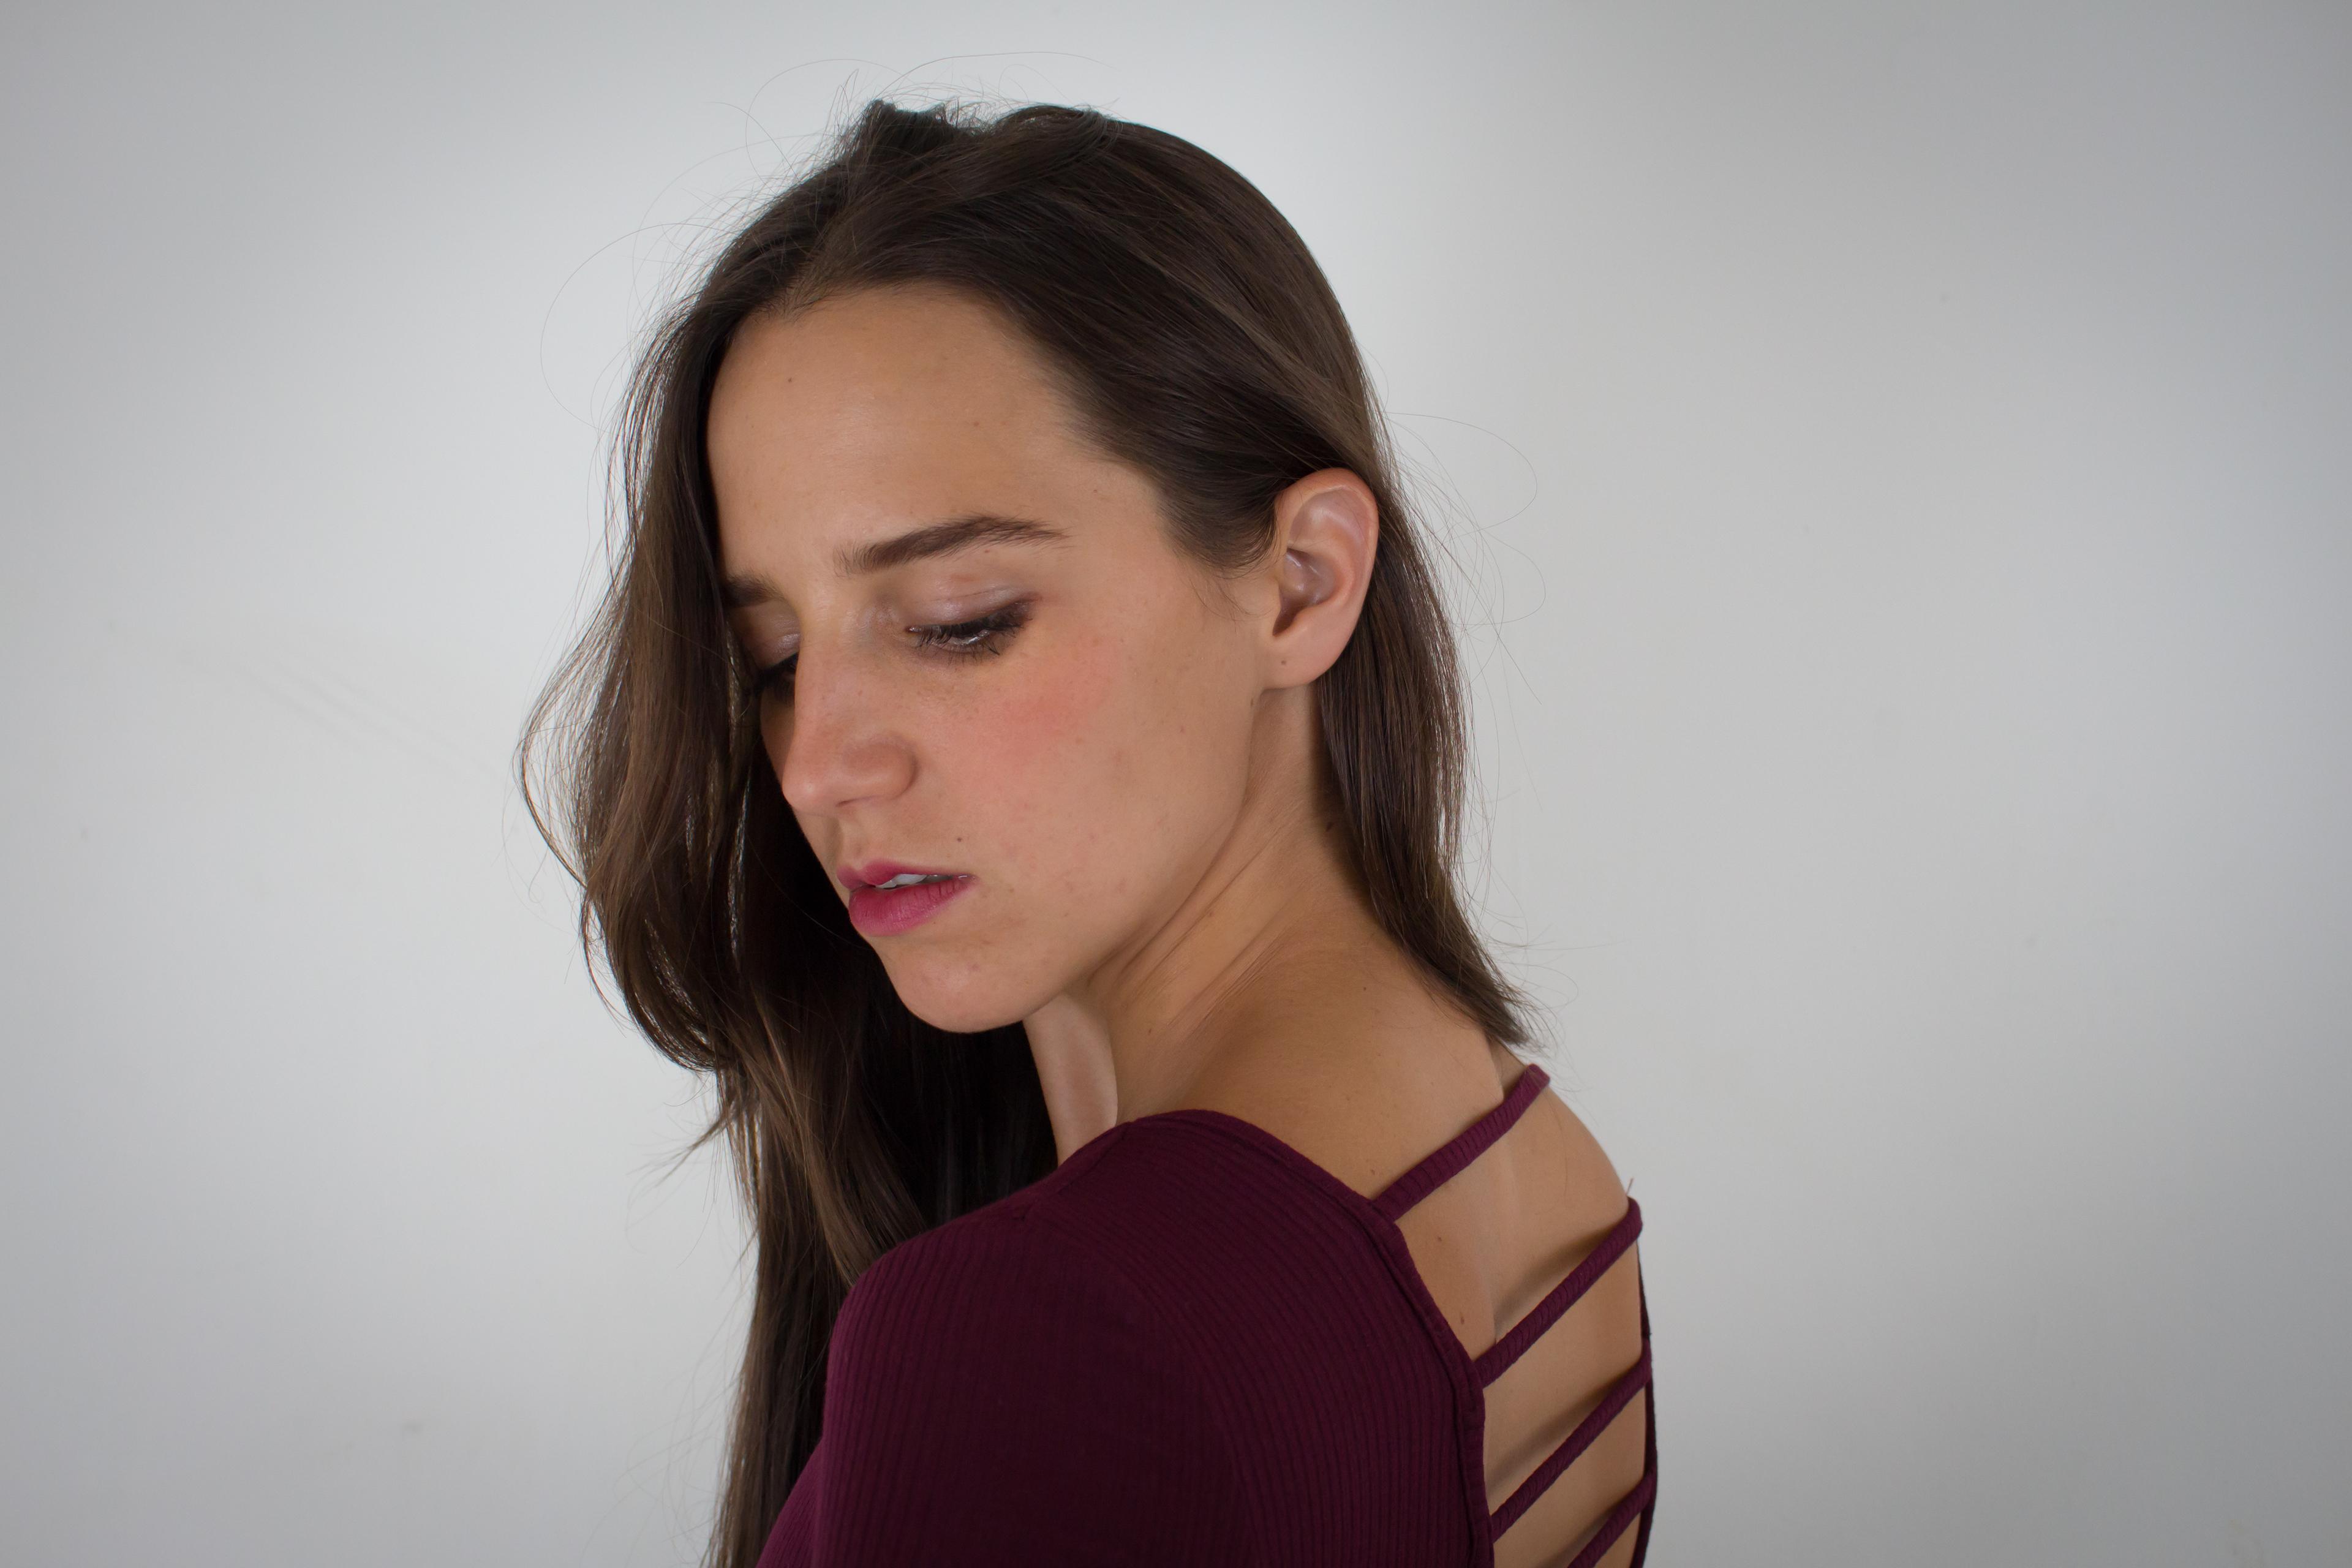 Alessandra Palladino